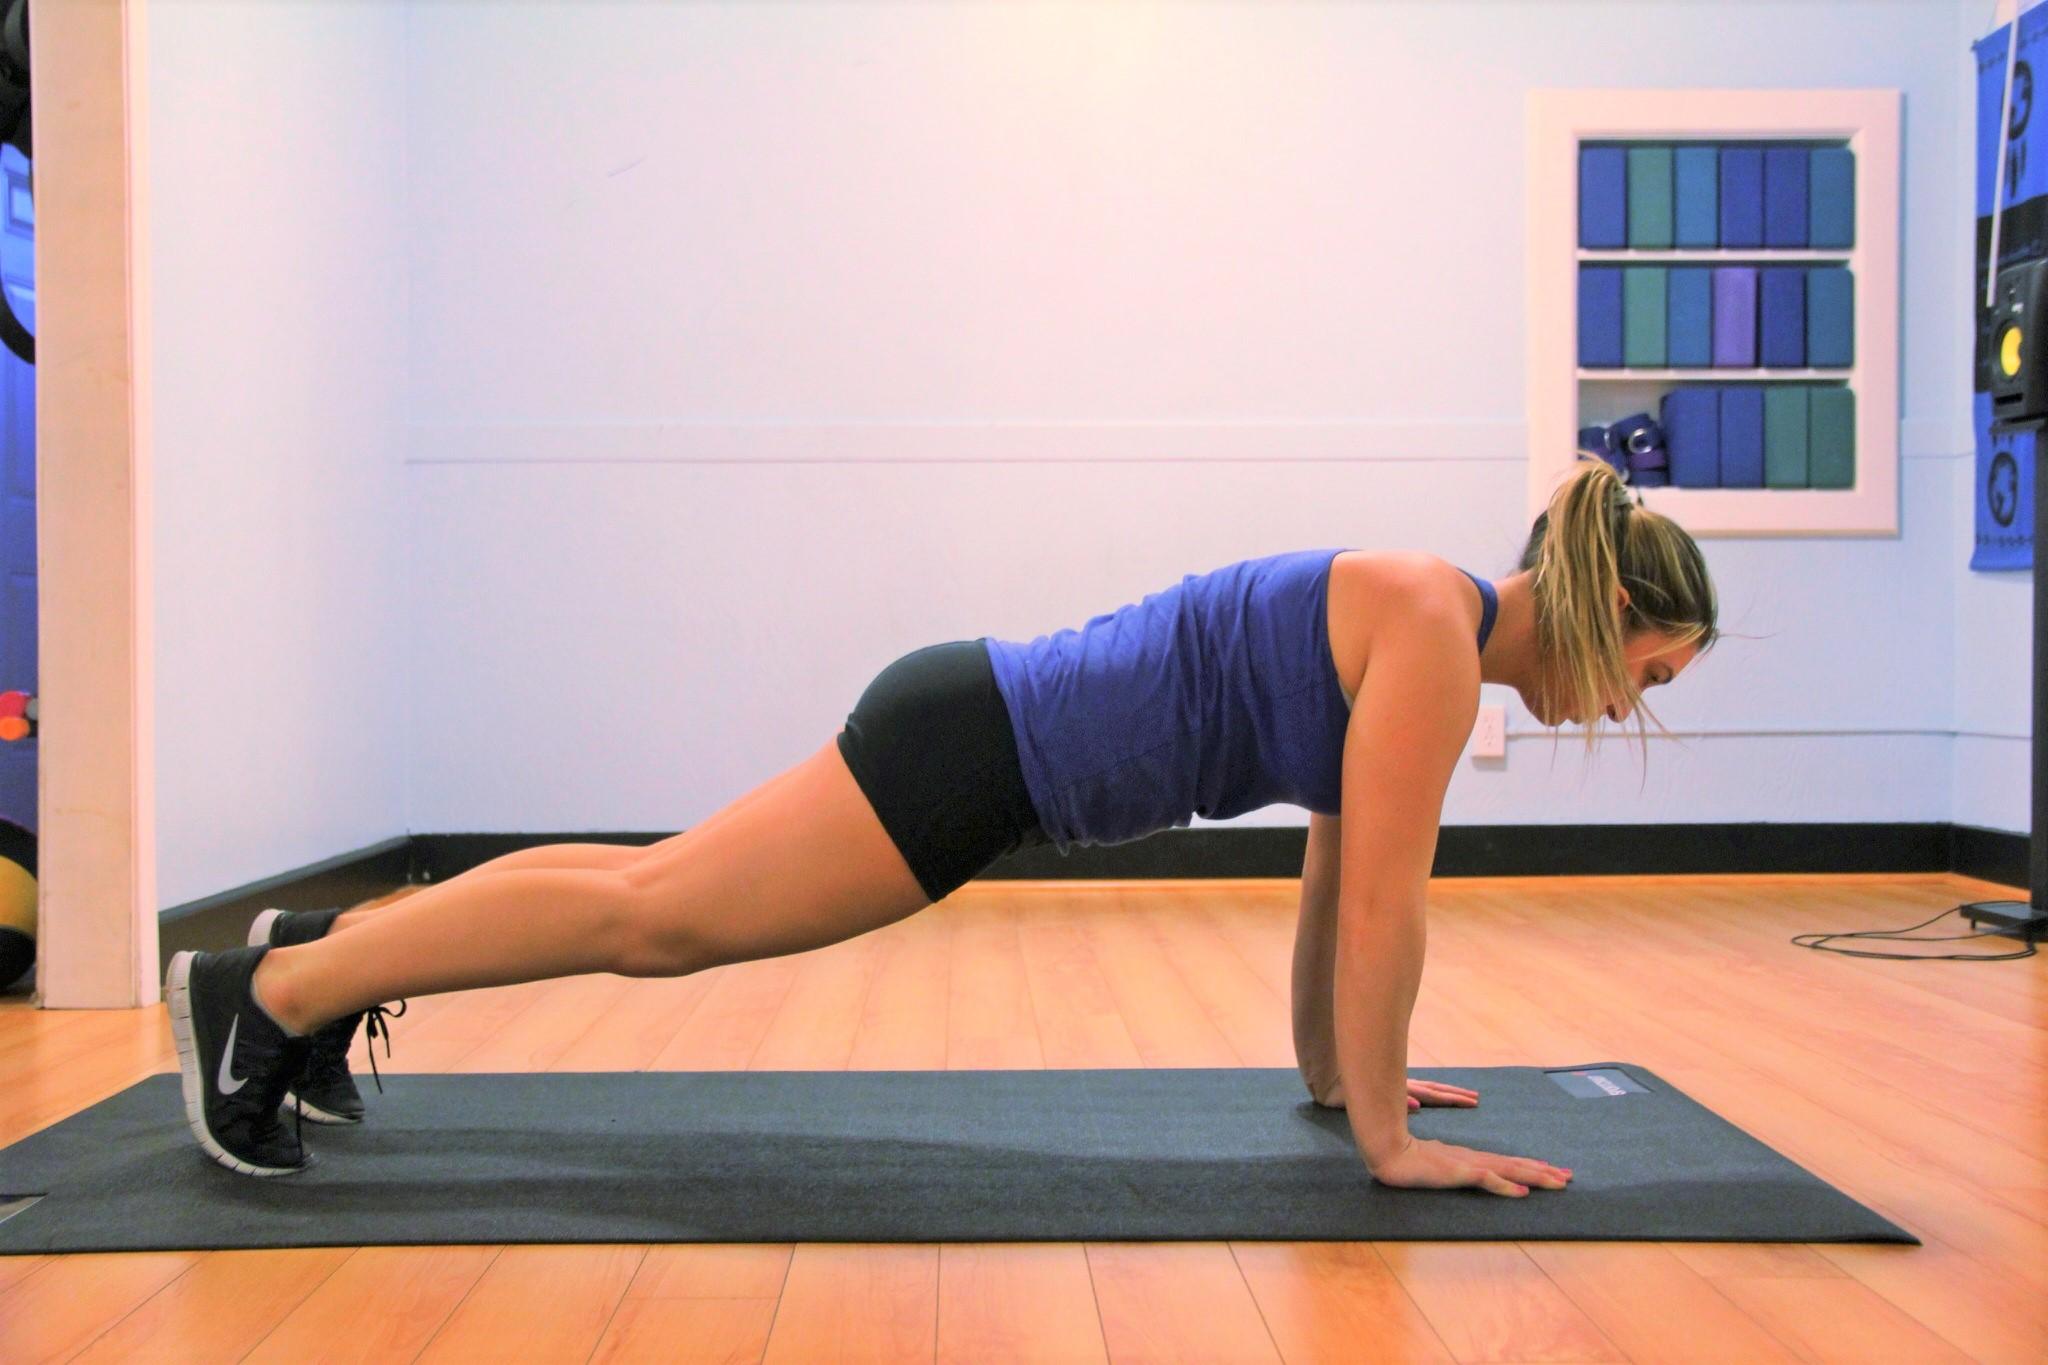 Plank|planking